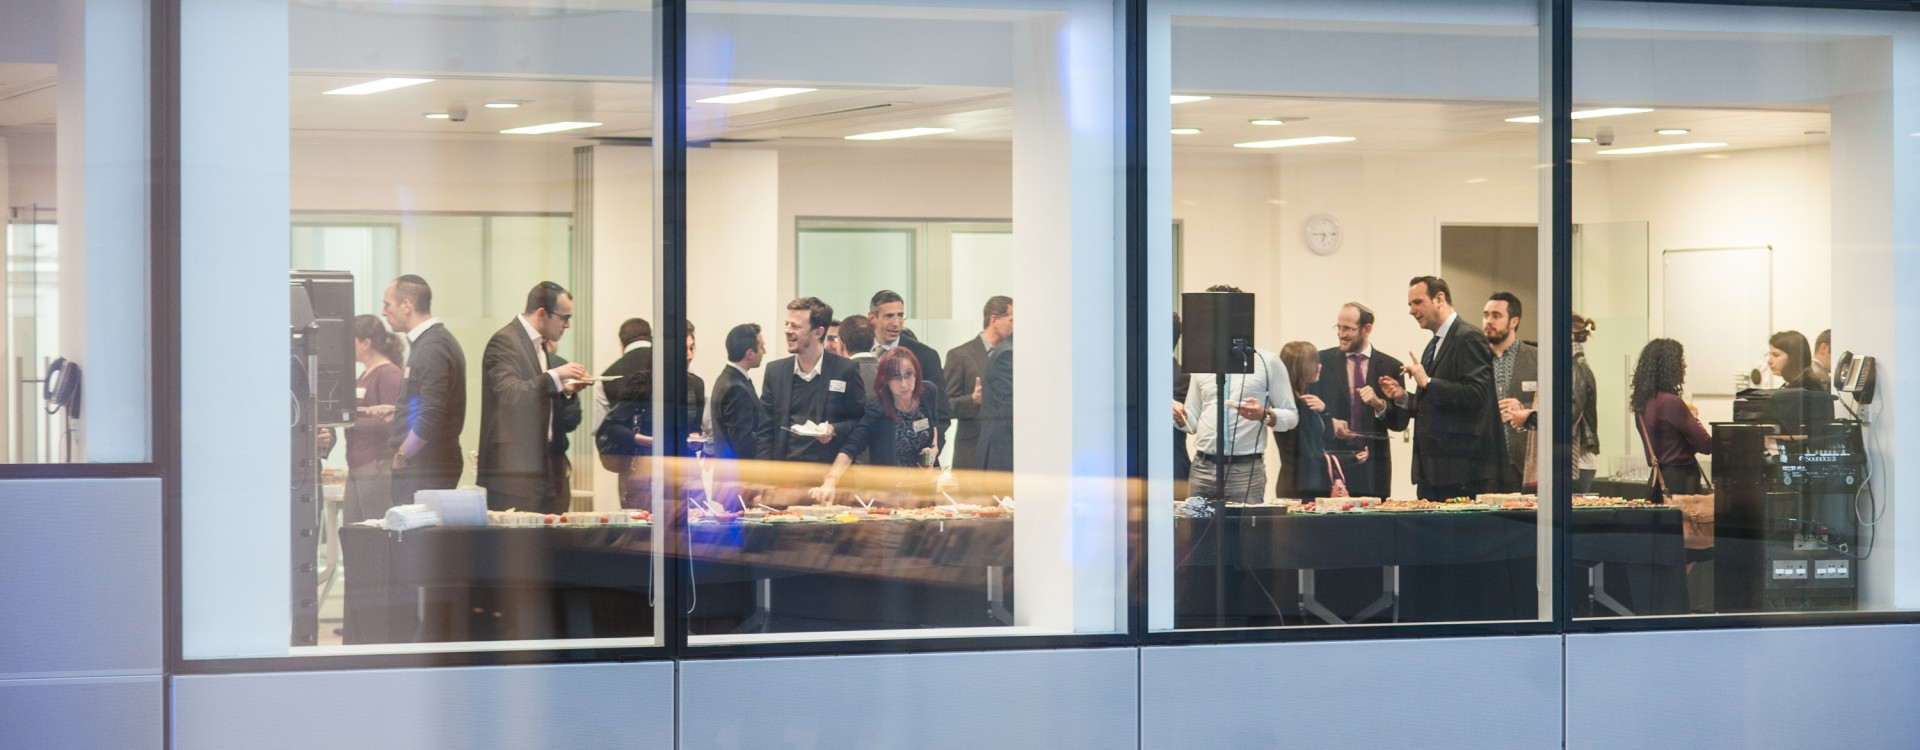 employers meeting to discuss vacancies